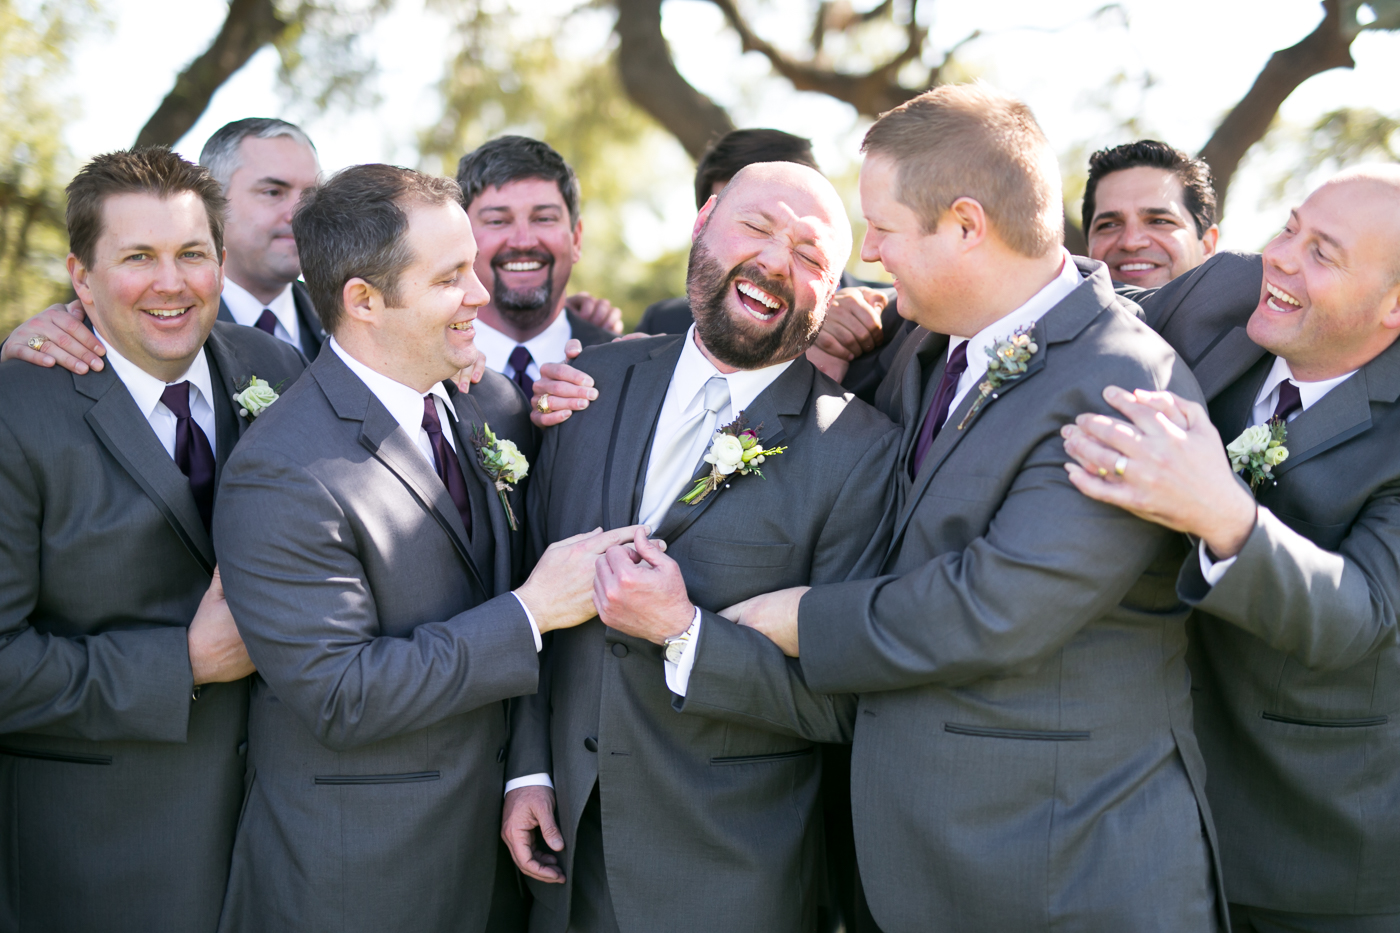 Austin-wedding-photo-and-video-015.jpg